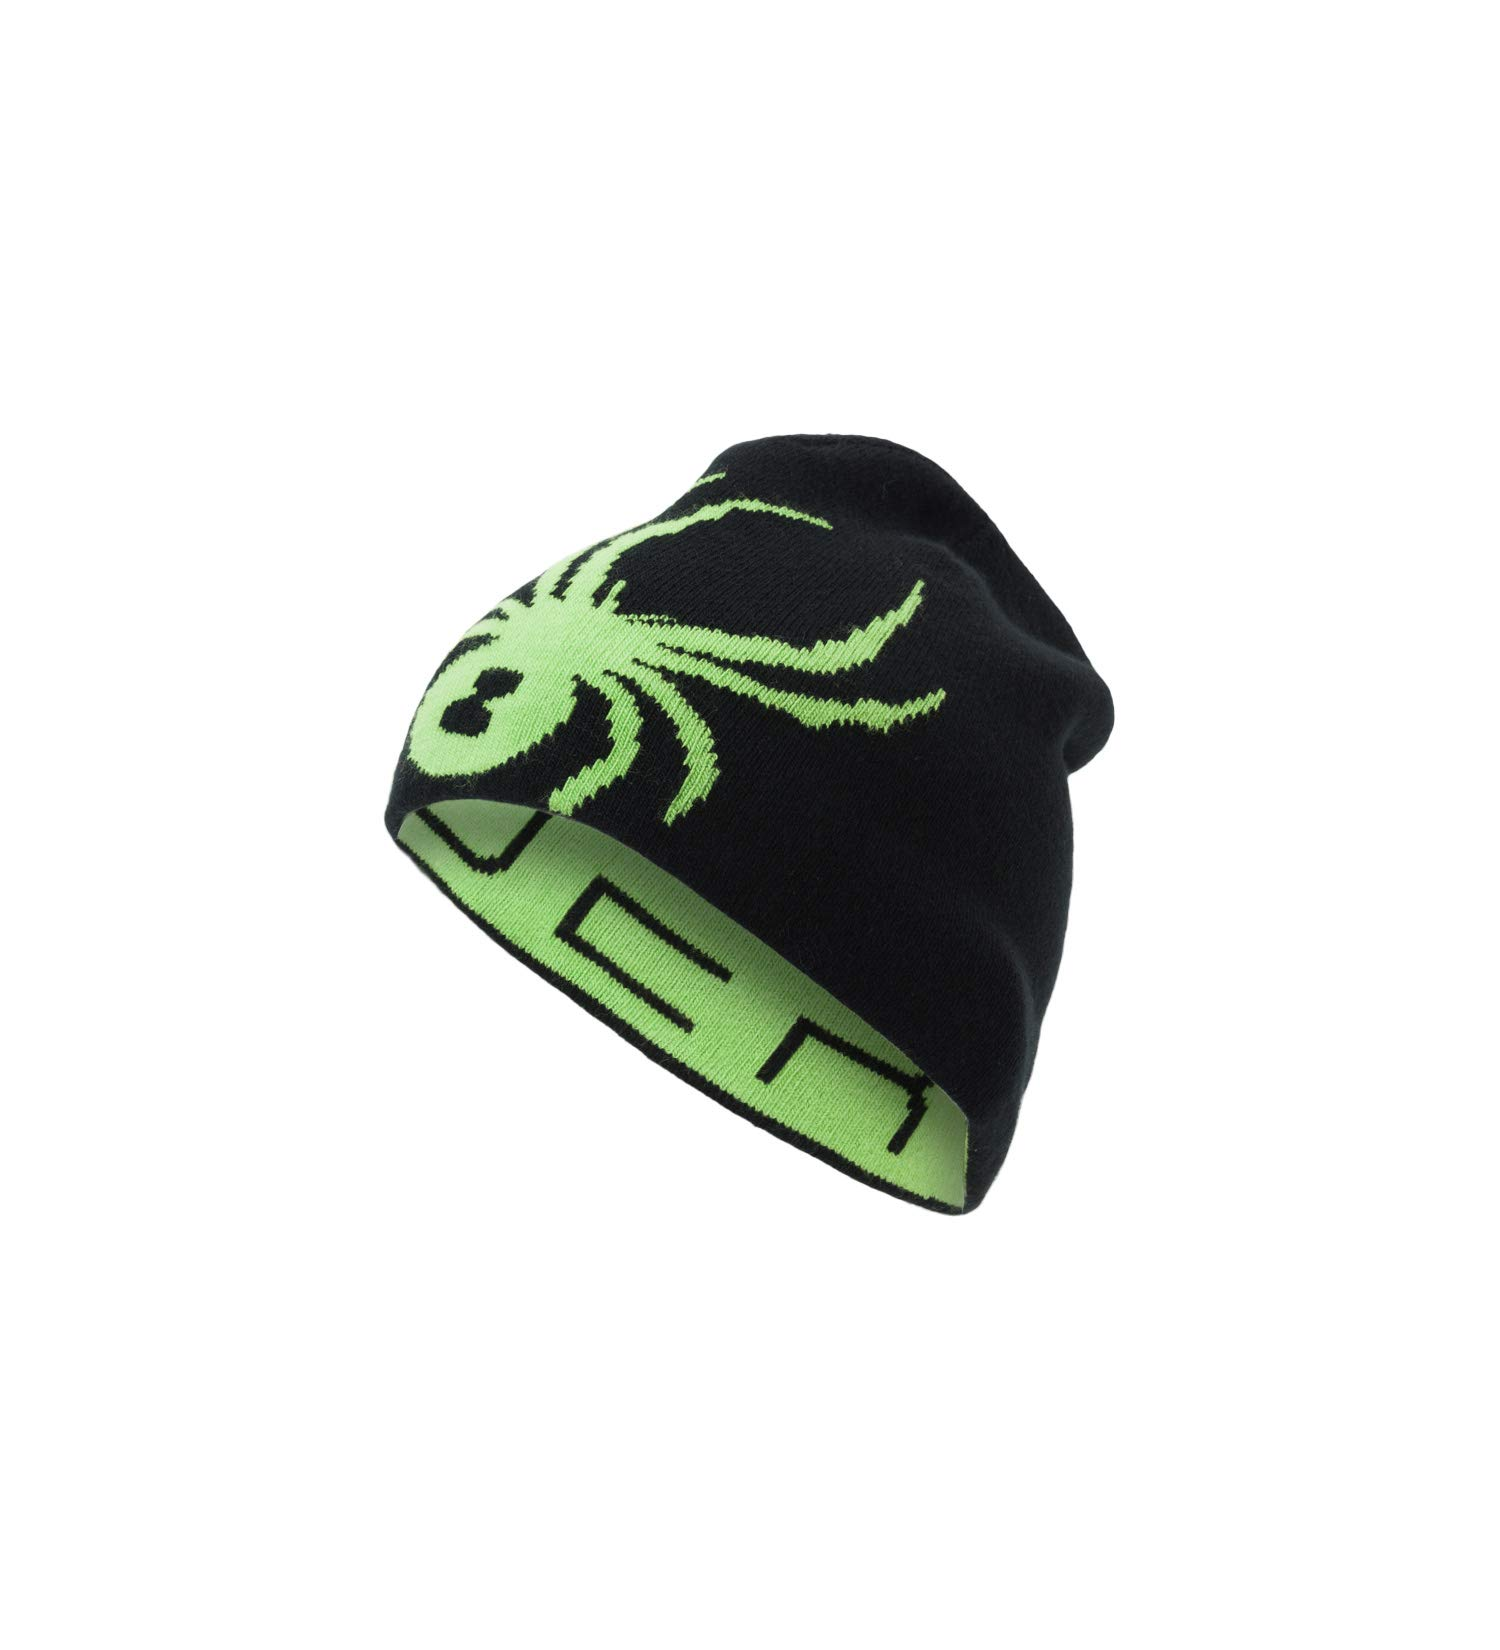 Spyder Boys' Reversible Bug Hat, Fresh/Black, One Size